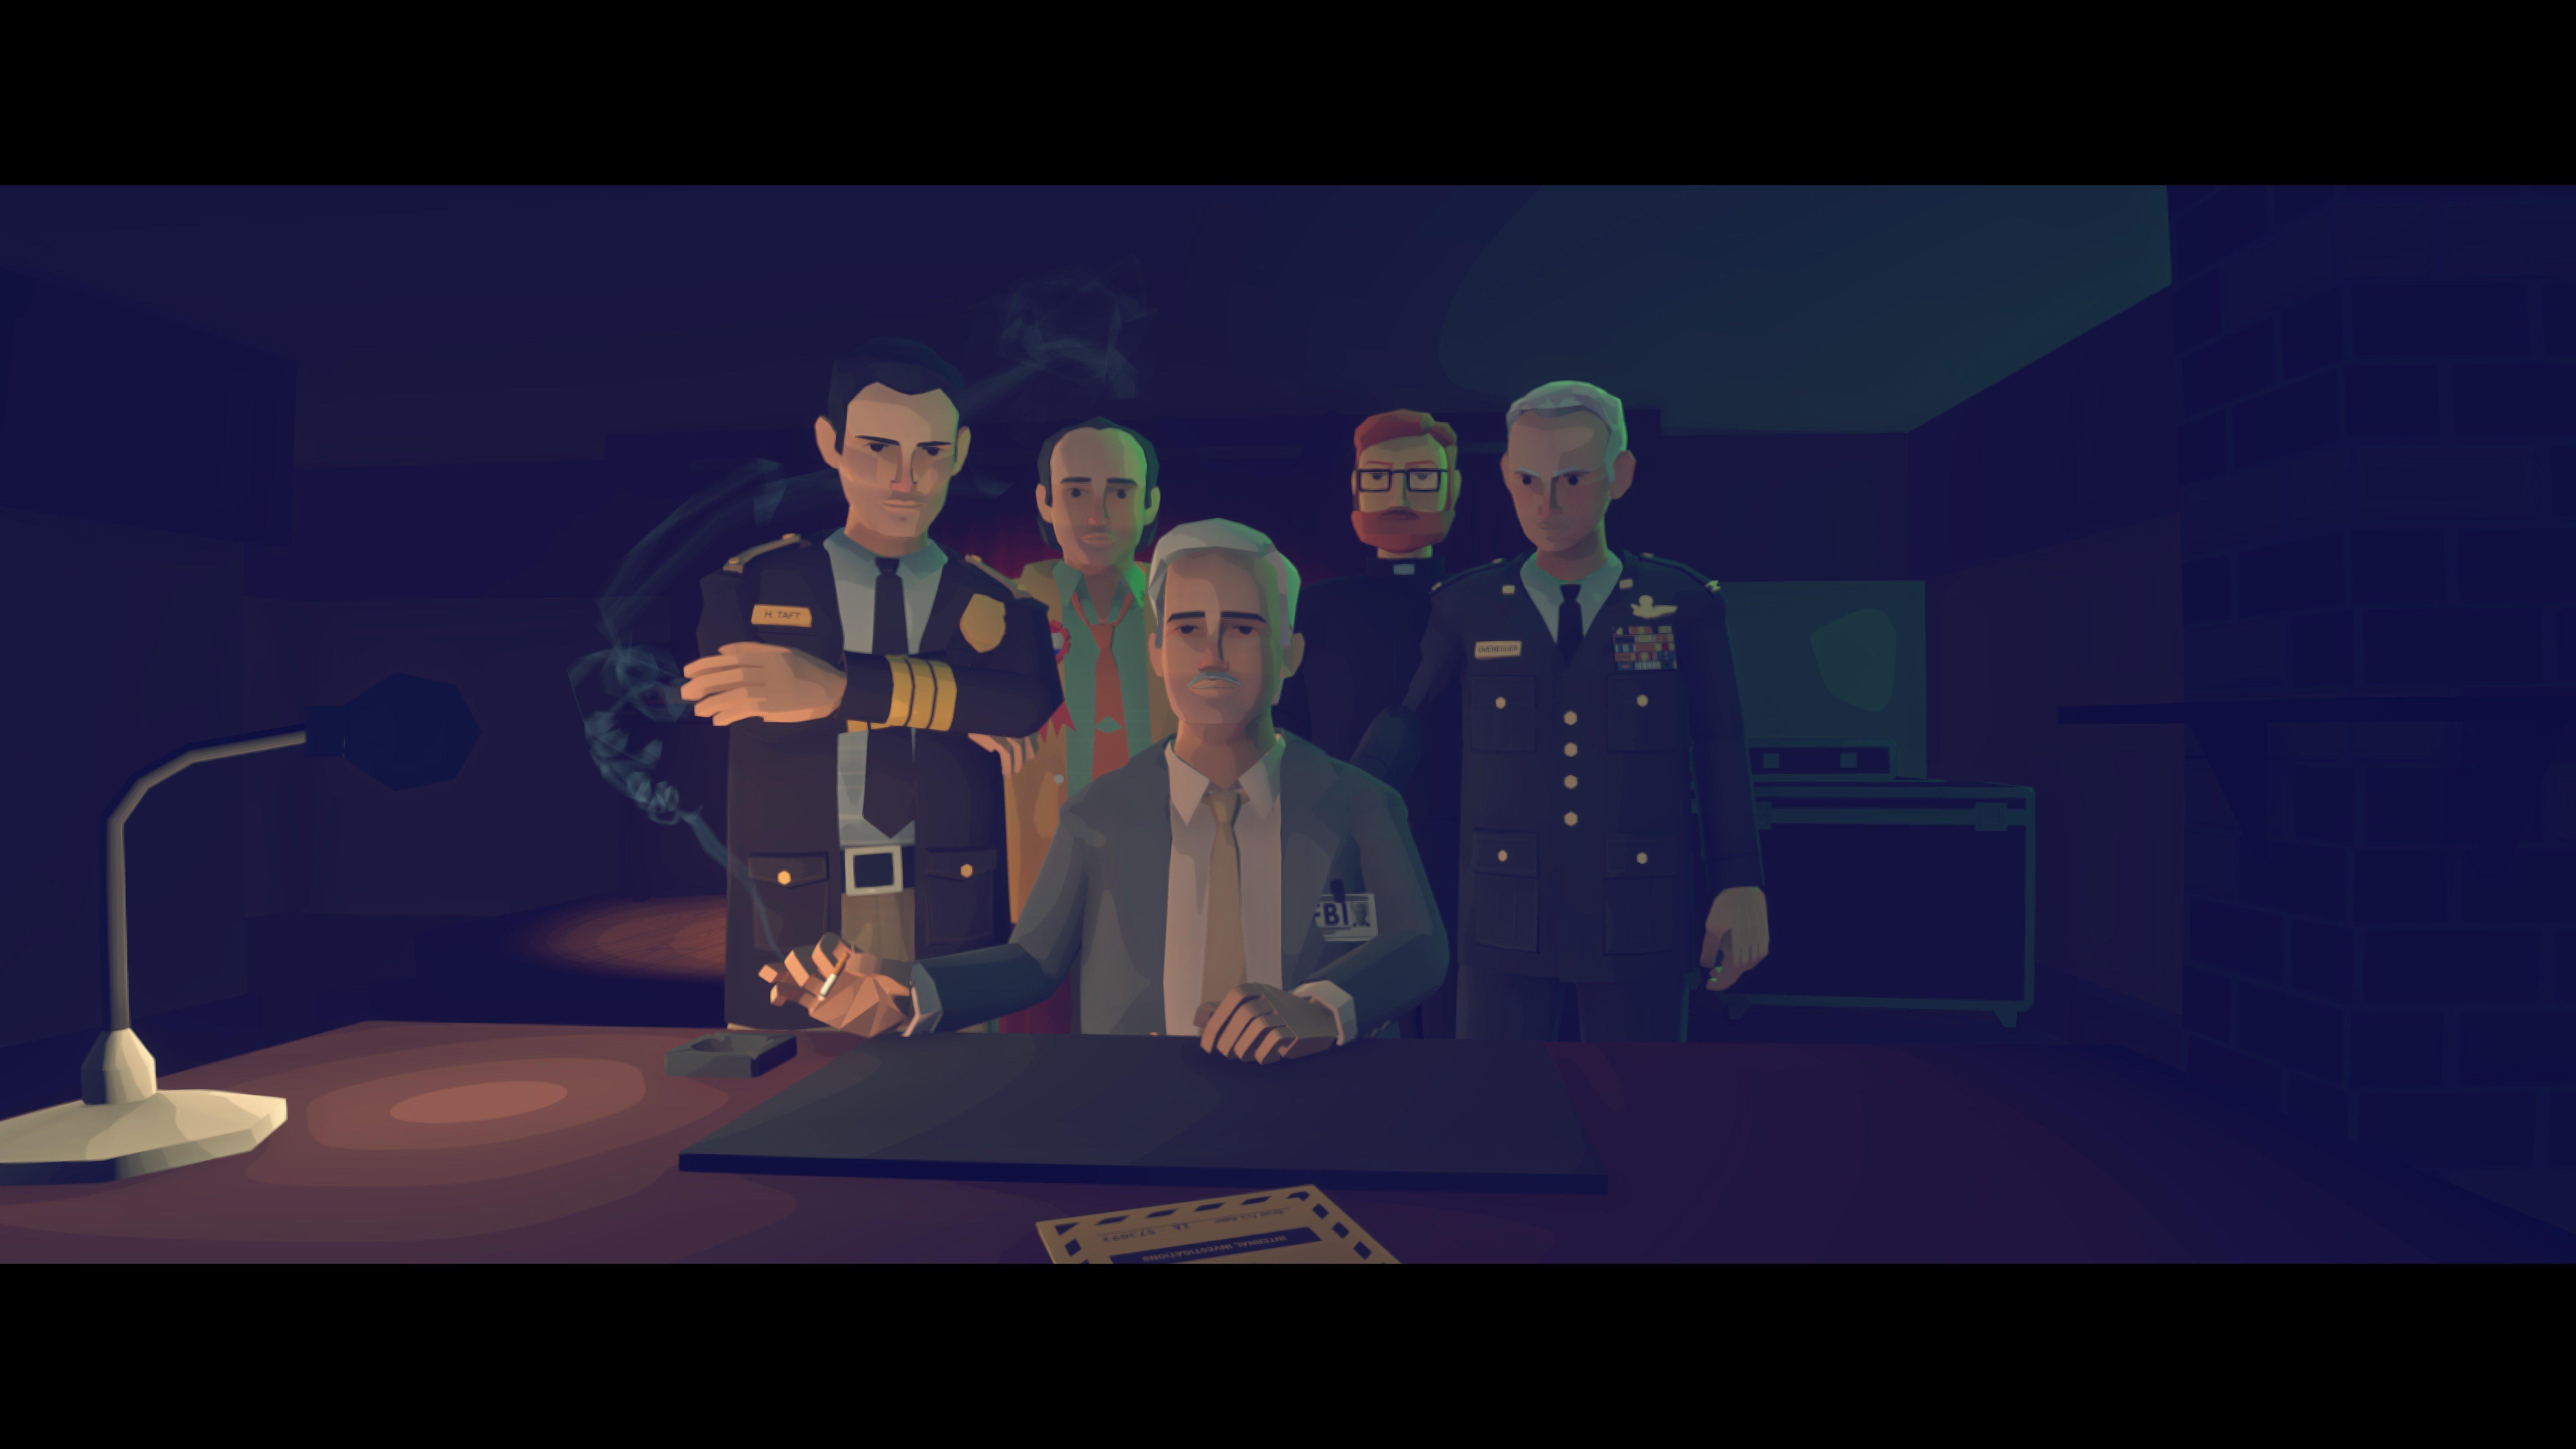 Virginia game image